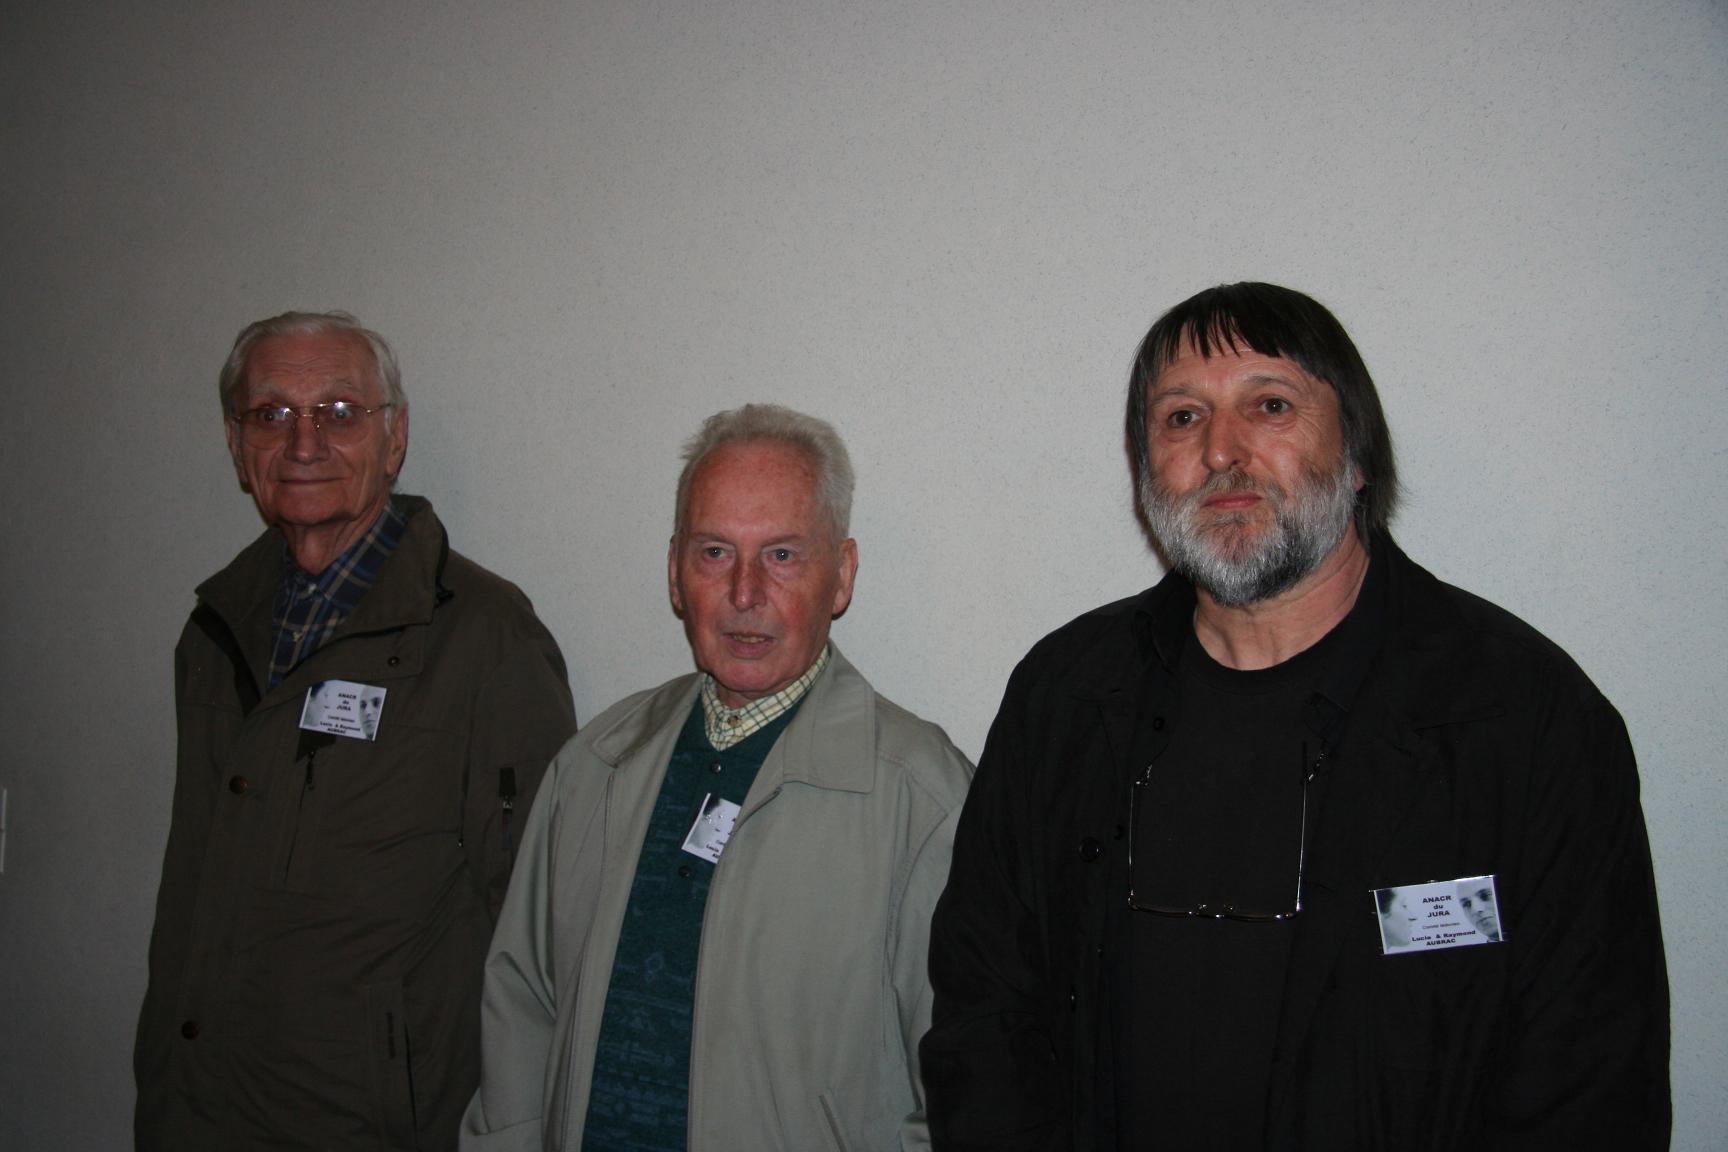 Roger Pernot, Jean Machuron, Jean-Claude Herbillon - Membres de l'ANACR